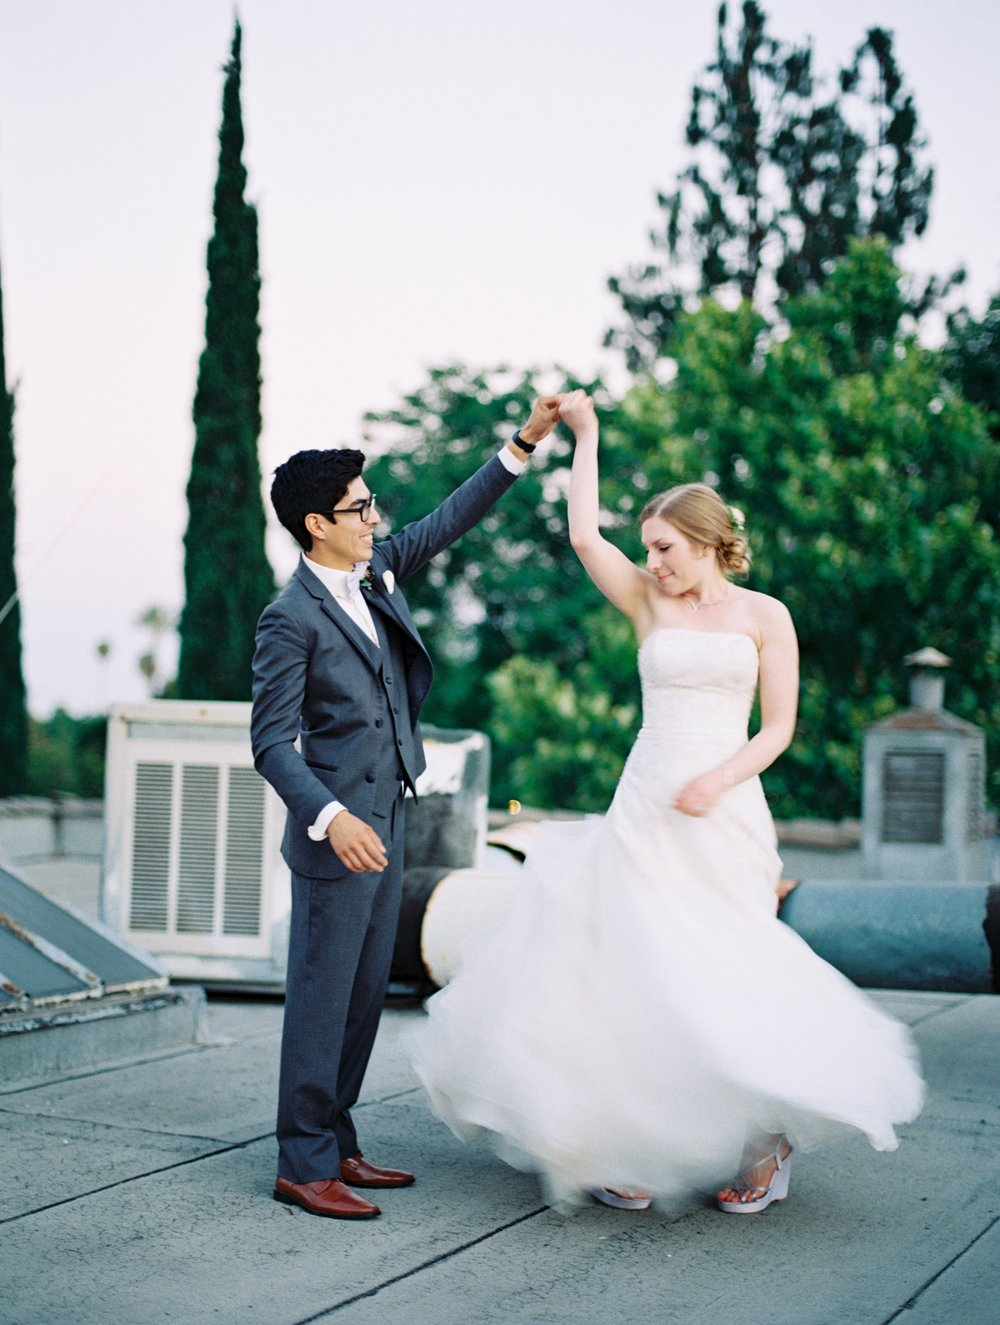 wedding ontario california angie mike 46.jpg